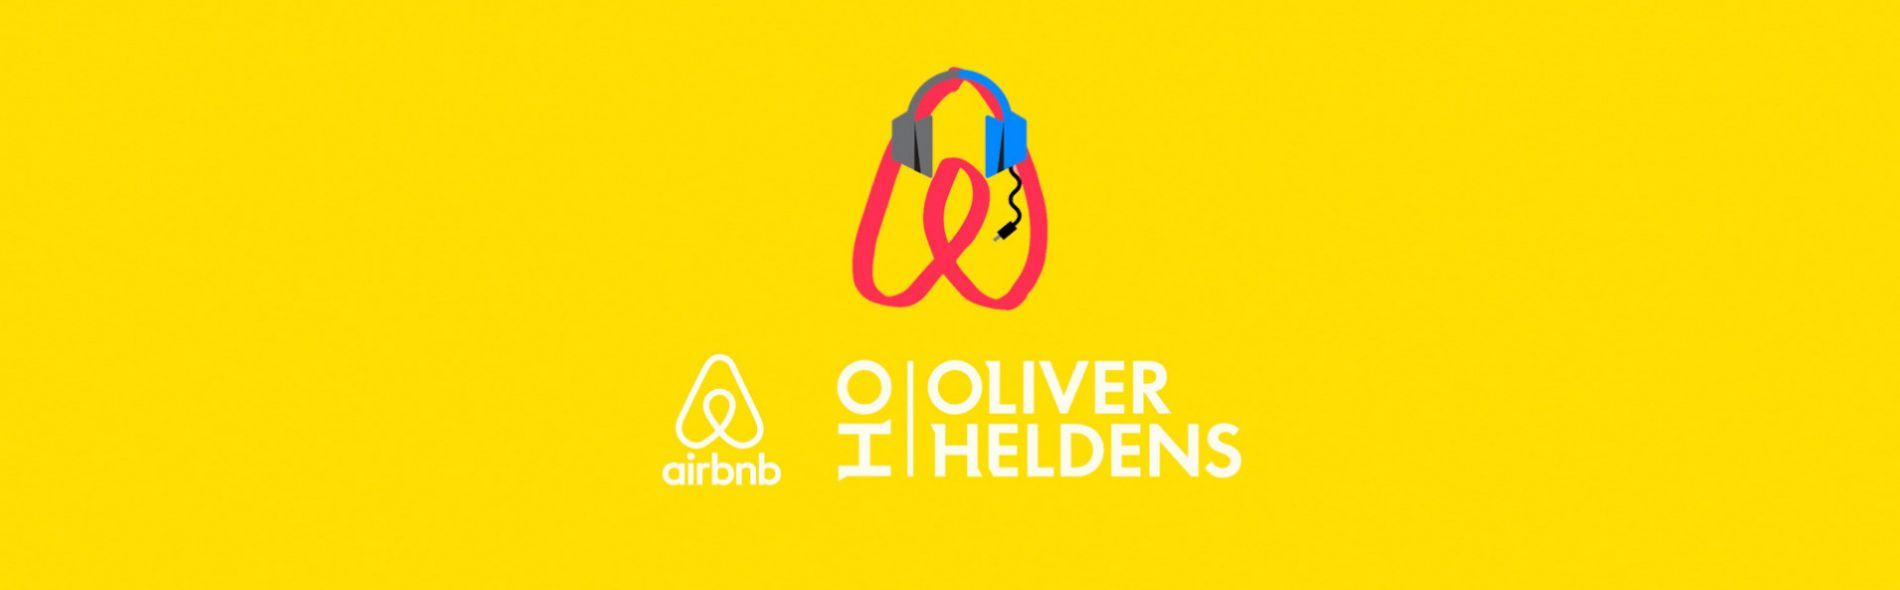 AirBNB & Oliver Heldens